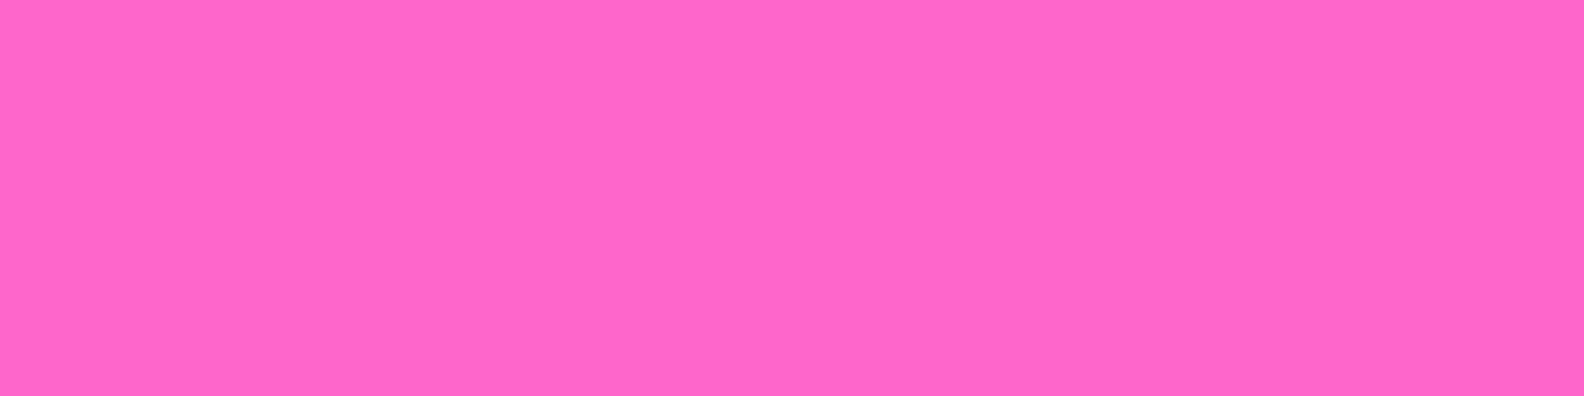 1584x396 Rose Pink Solid Color Background